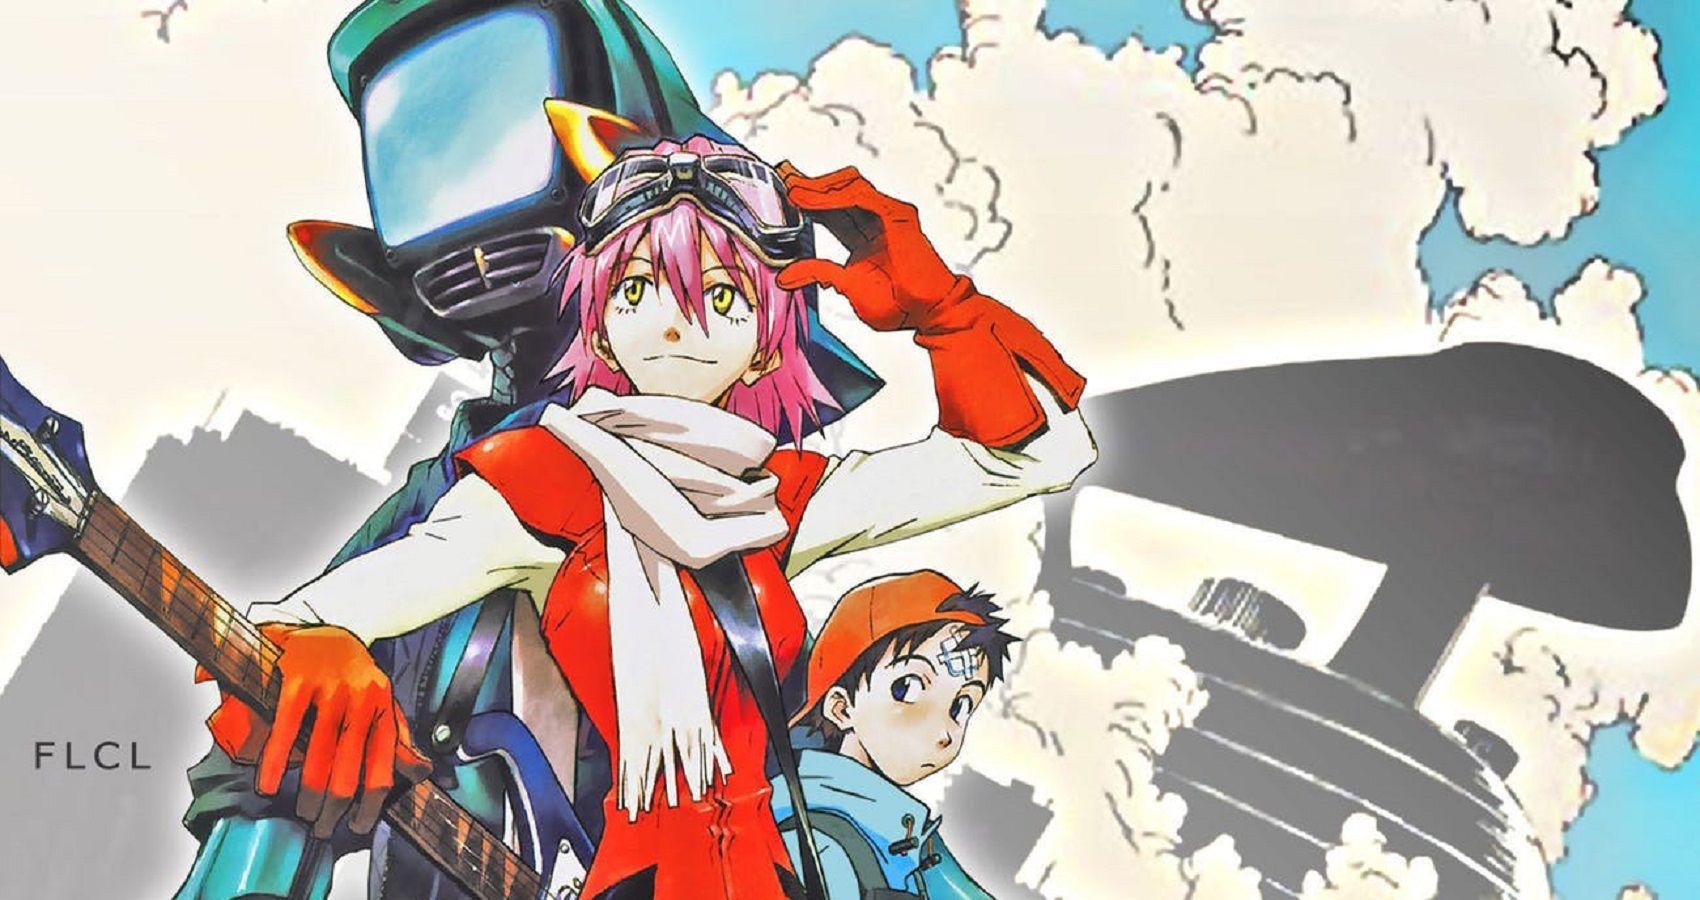 The 10 Best Anime From Studio Gainax According To IMDb   CBR